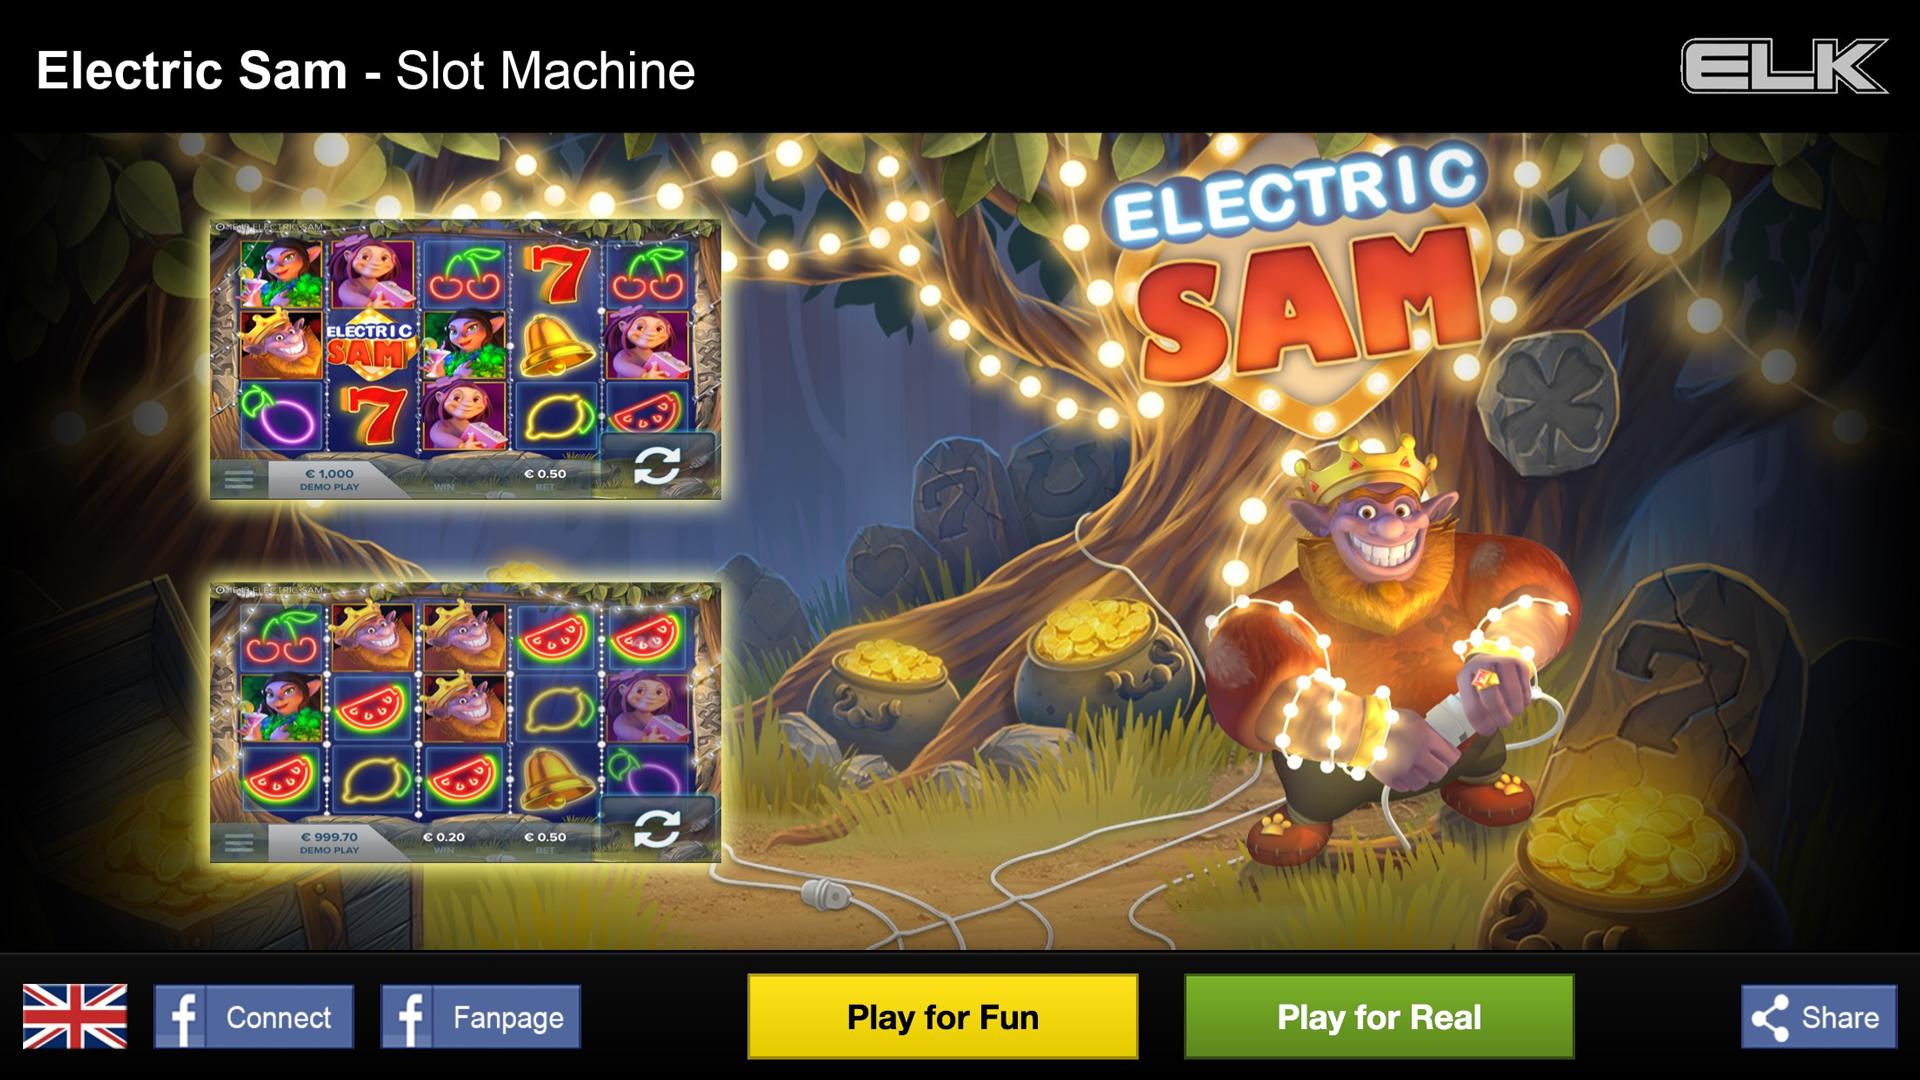 Electric Sam Slot Machine